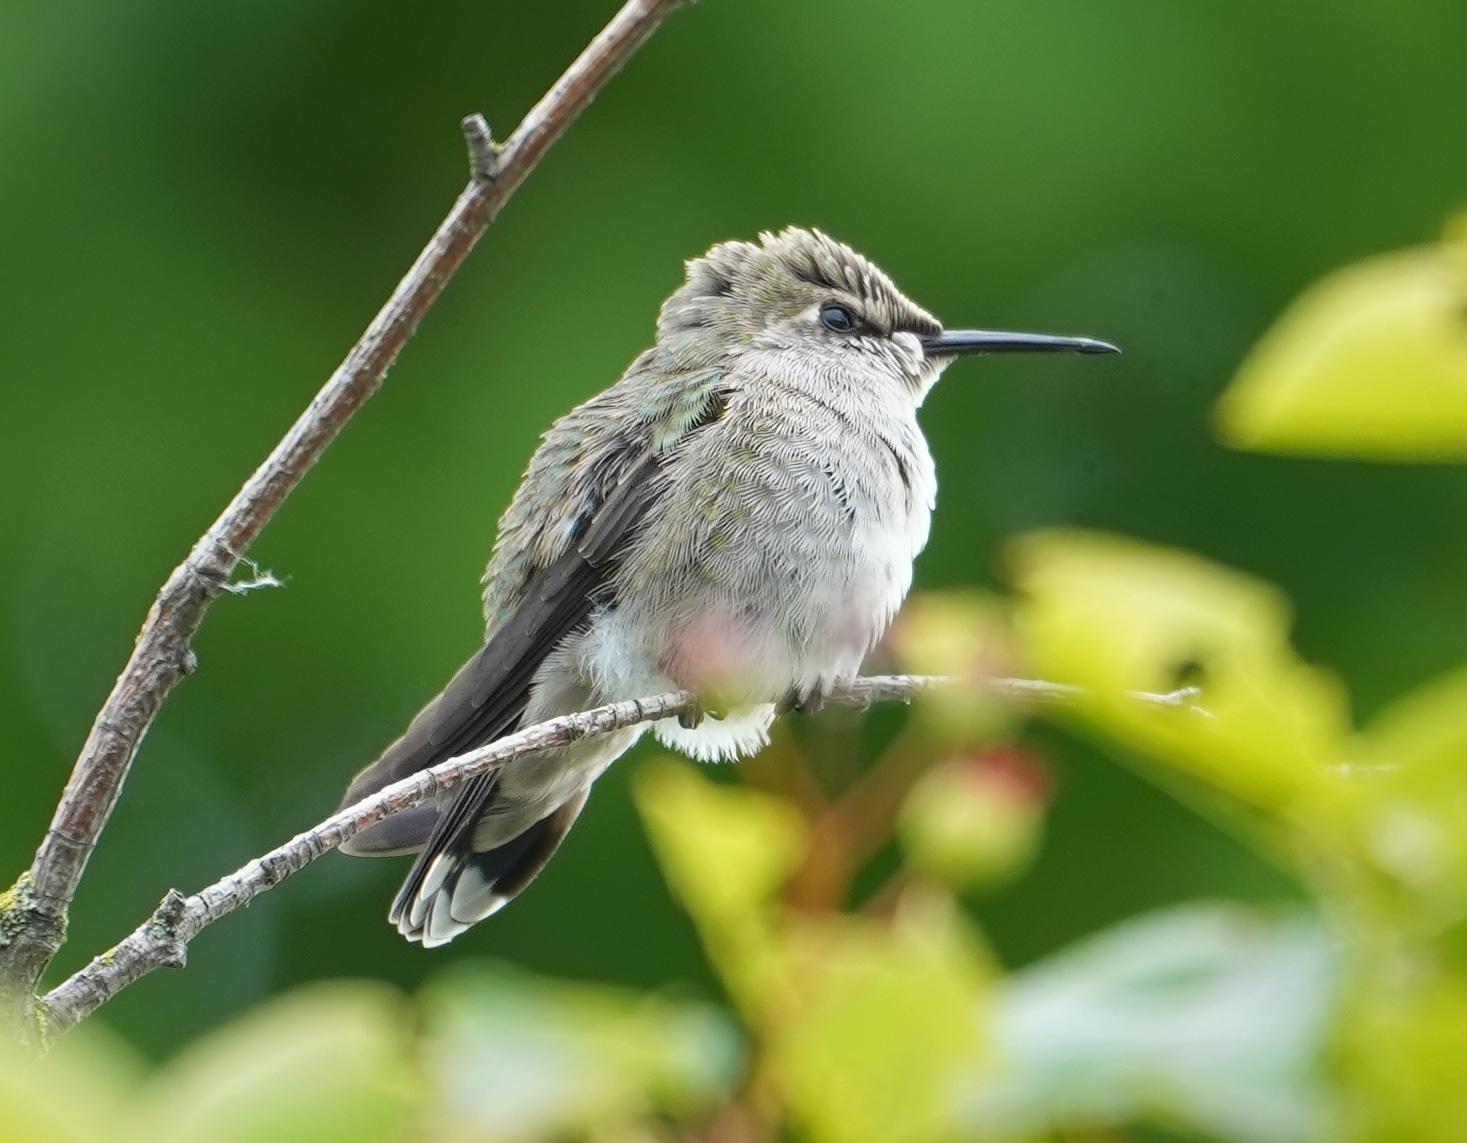 Juvenile Anna's hummingbird